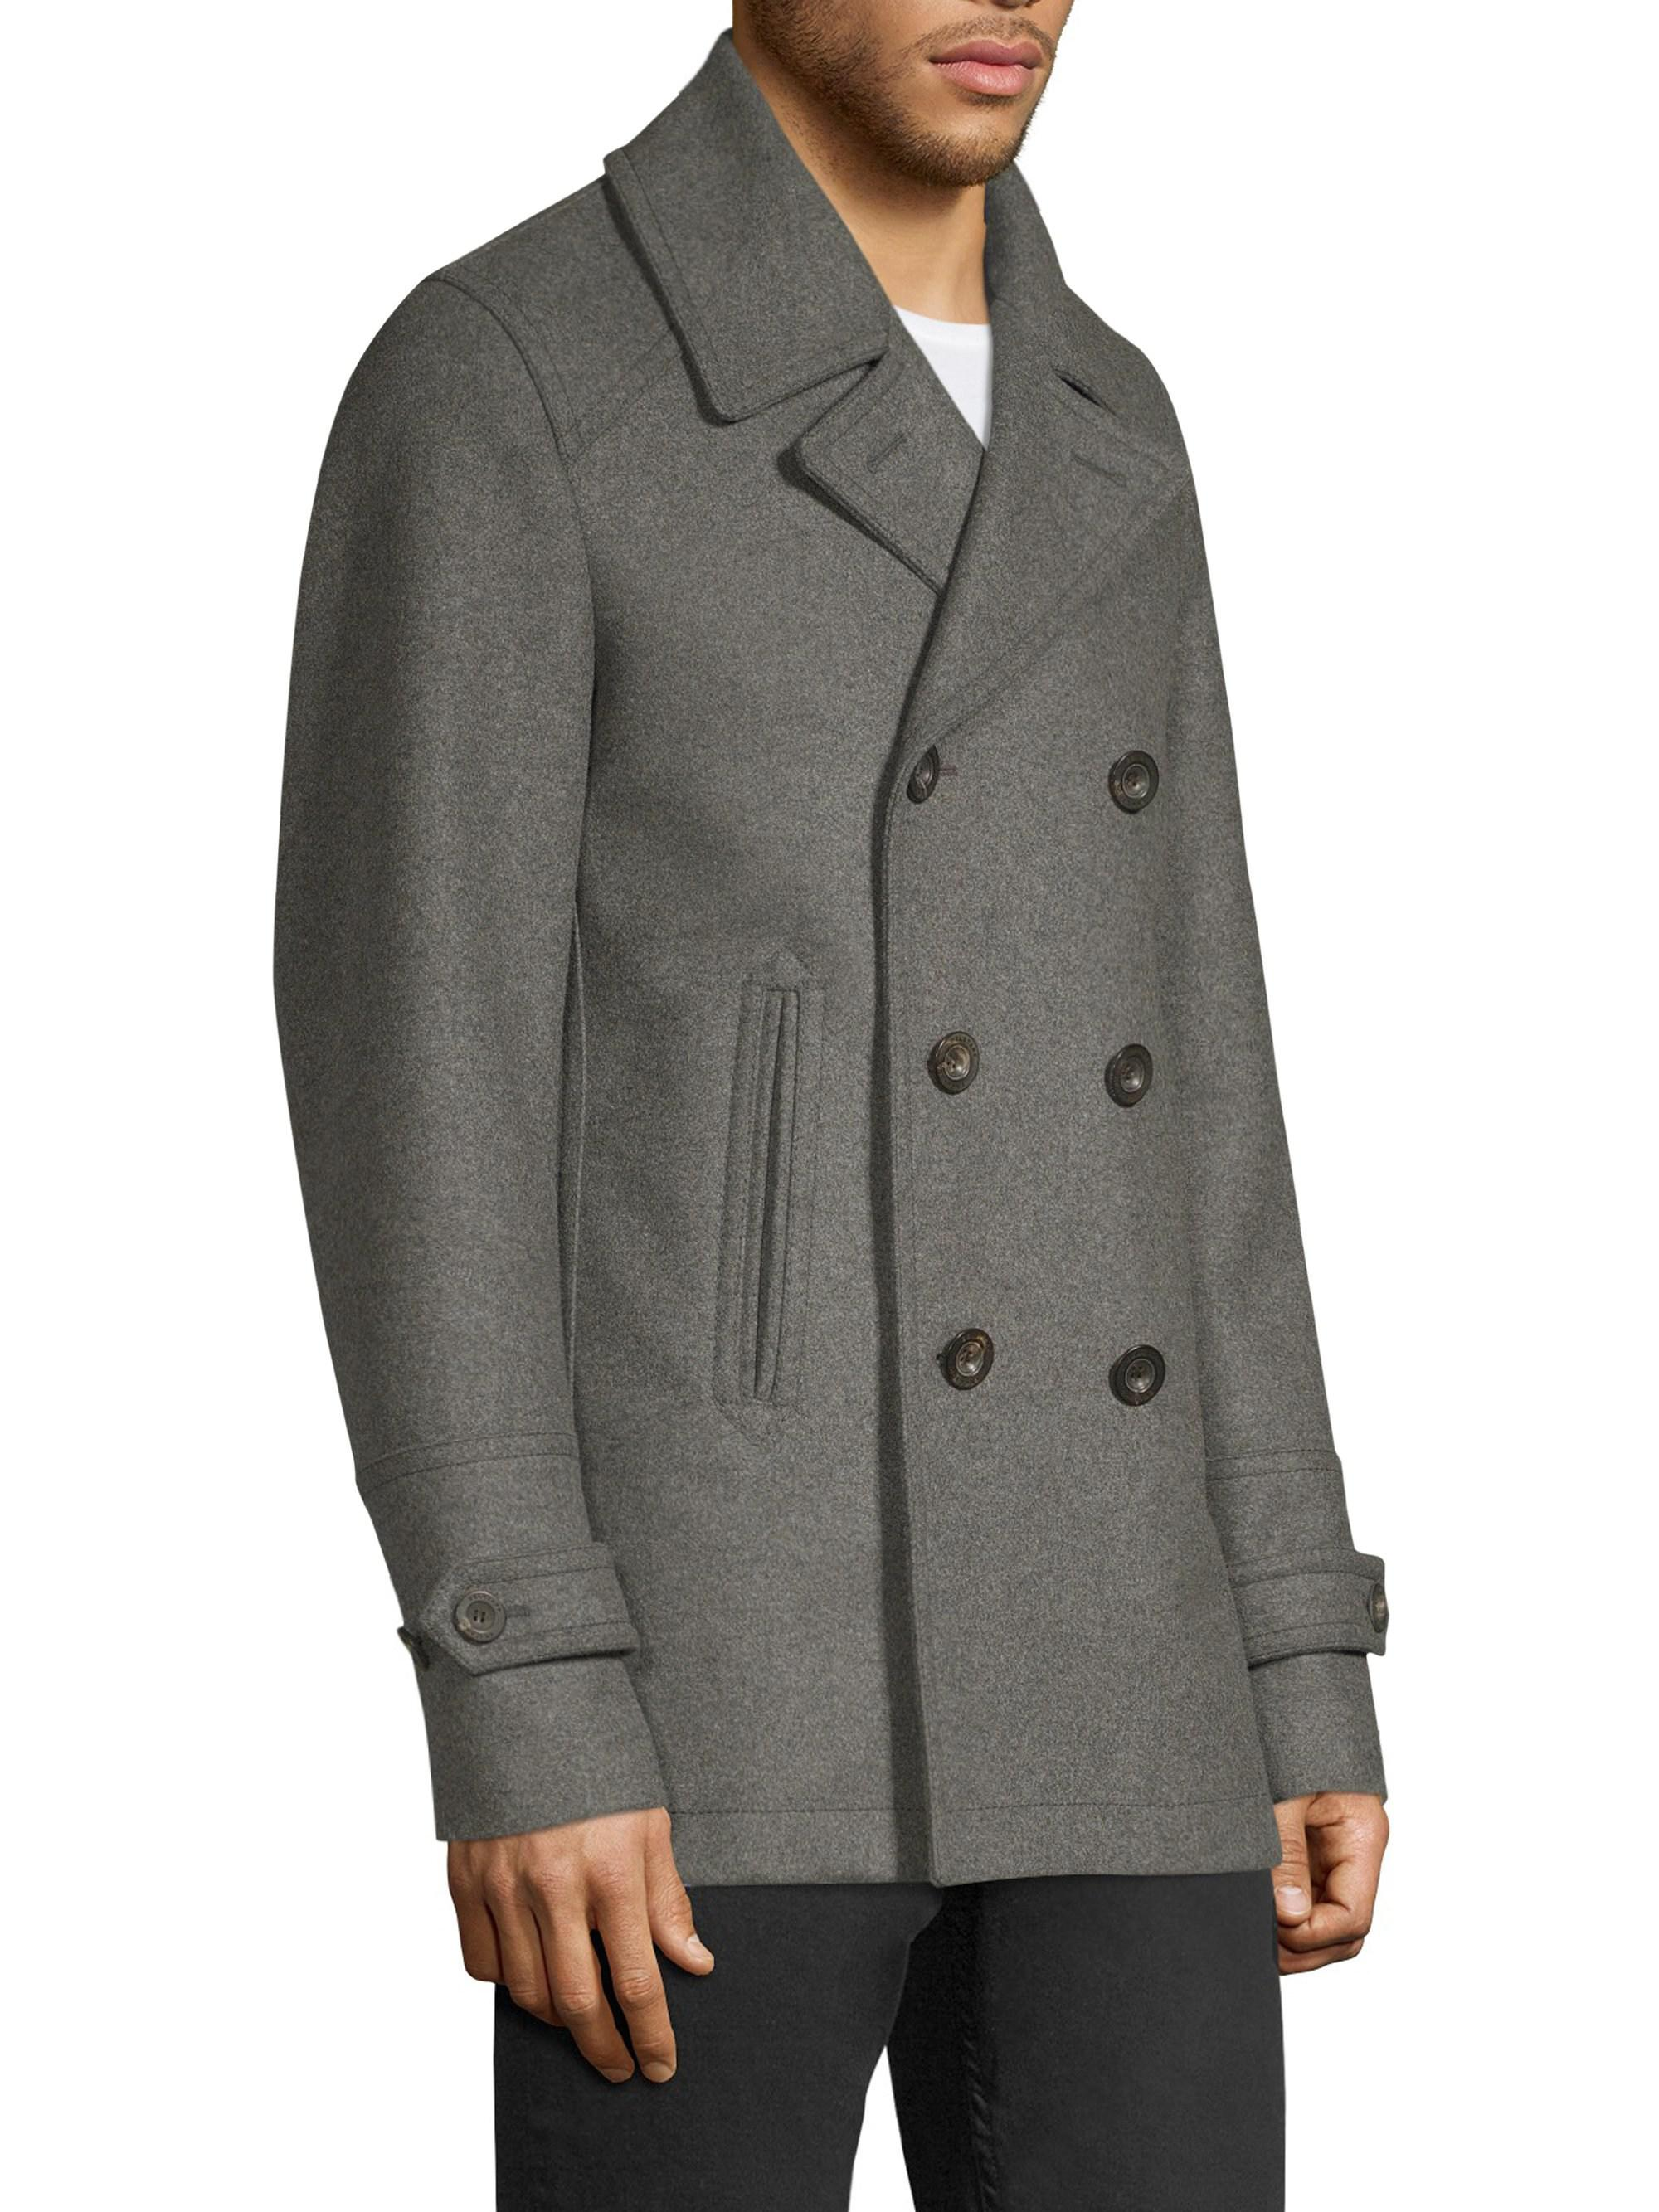 Virgin Belstaff Breasted Men Double Duran View Fullscreen Lyst Blend For Overcoat Gray Wool xIIqprCOw